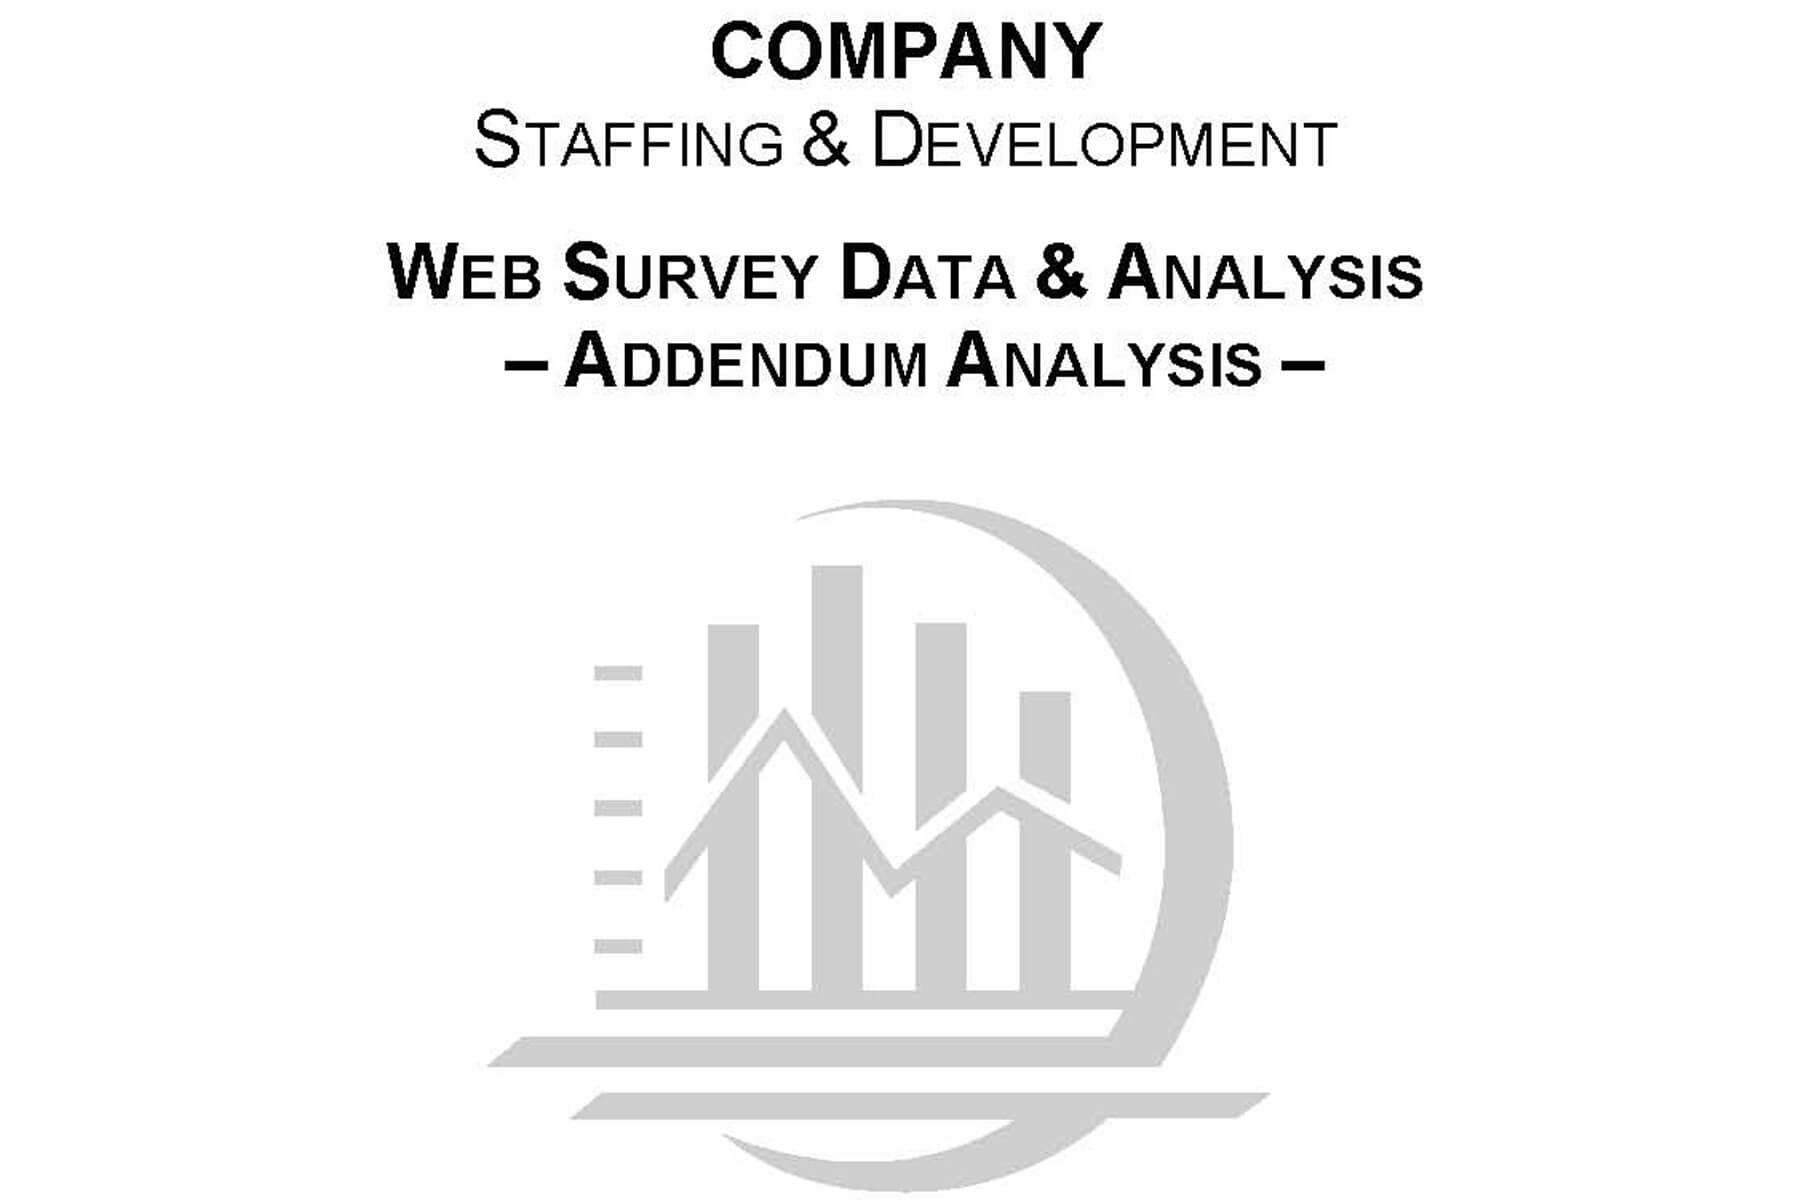 STAFFING-SURVEY-DATA-ANALYSIS-REPORT